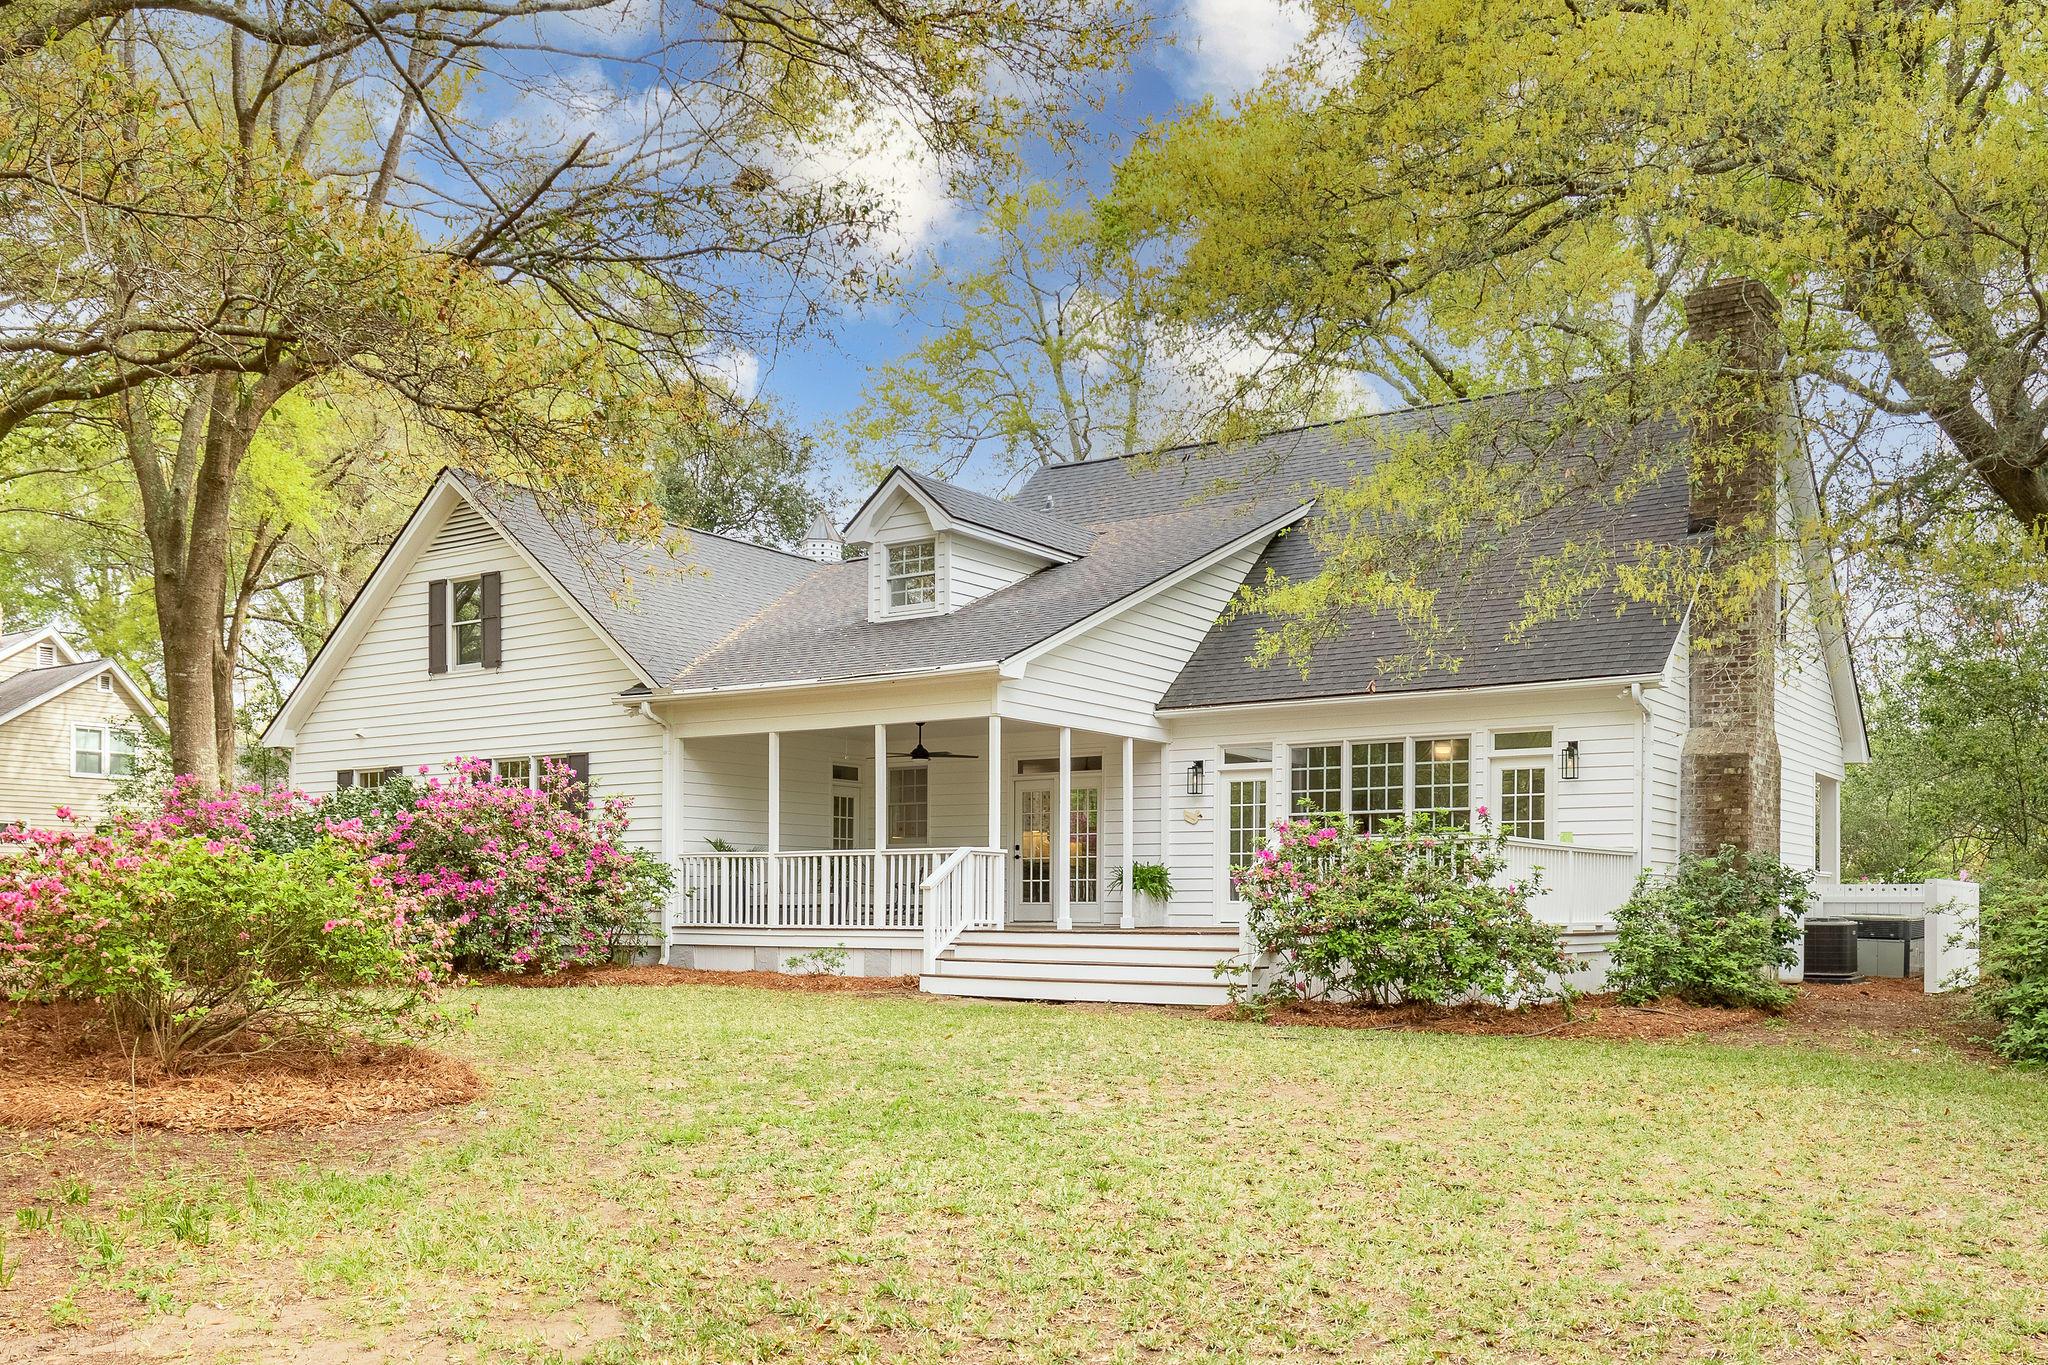 Old Mt Pleasant Homes For Sale - 1417 Edwards, Mount Pleasant, SC - 57